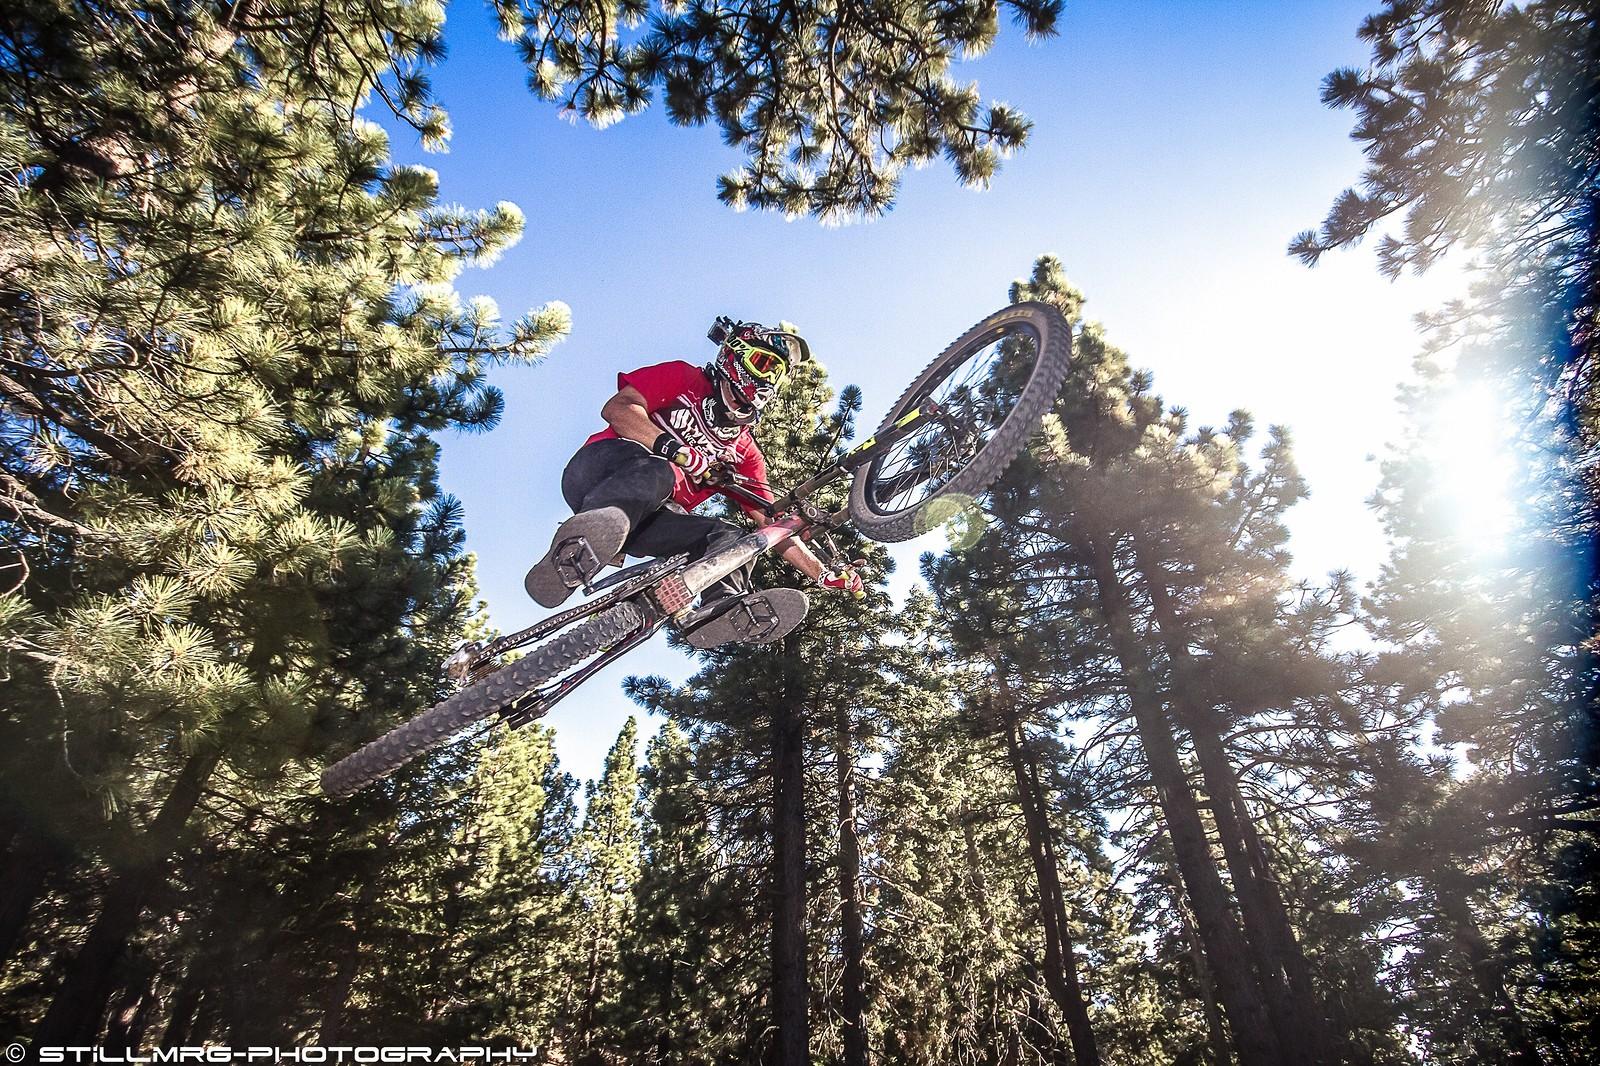 Flying as a bird - Stillmrg Photography - Mountain Biking Pictures - Vital MTB